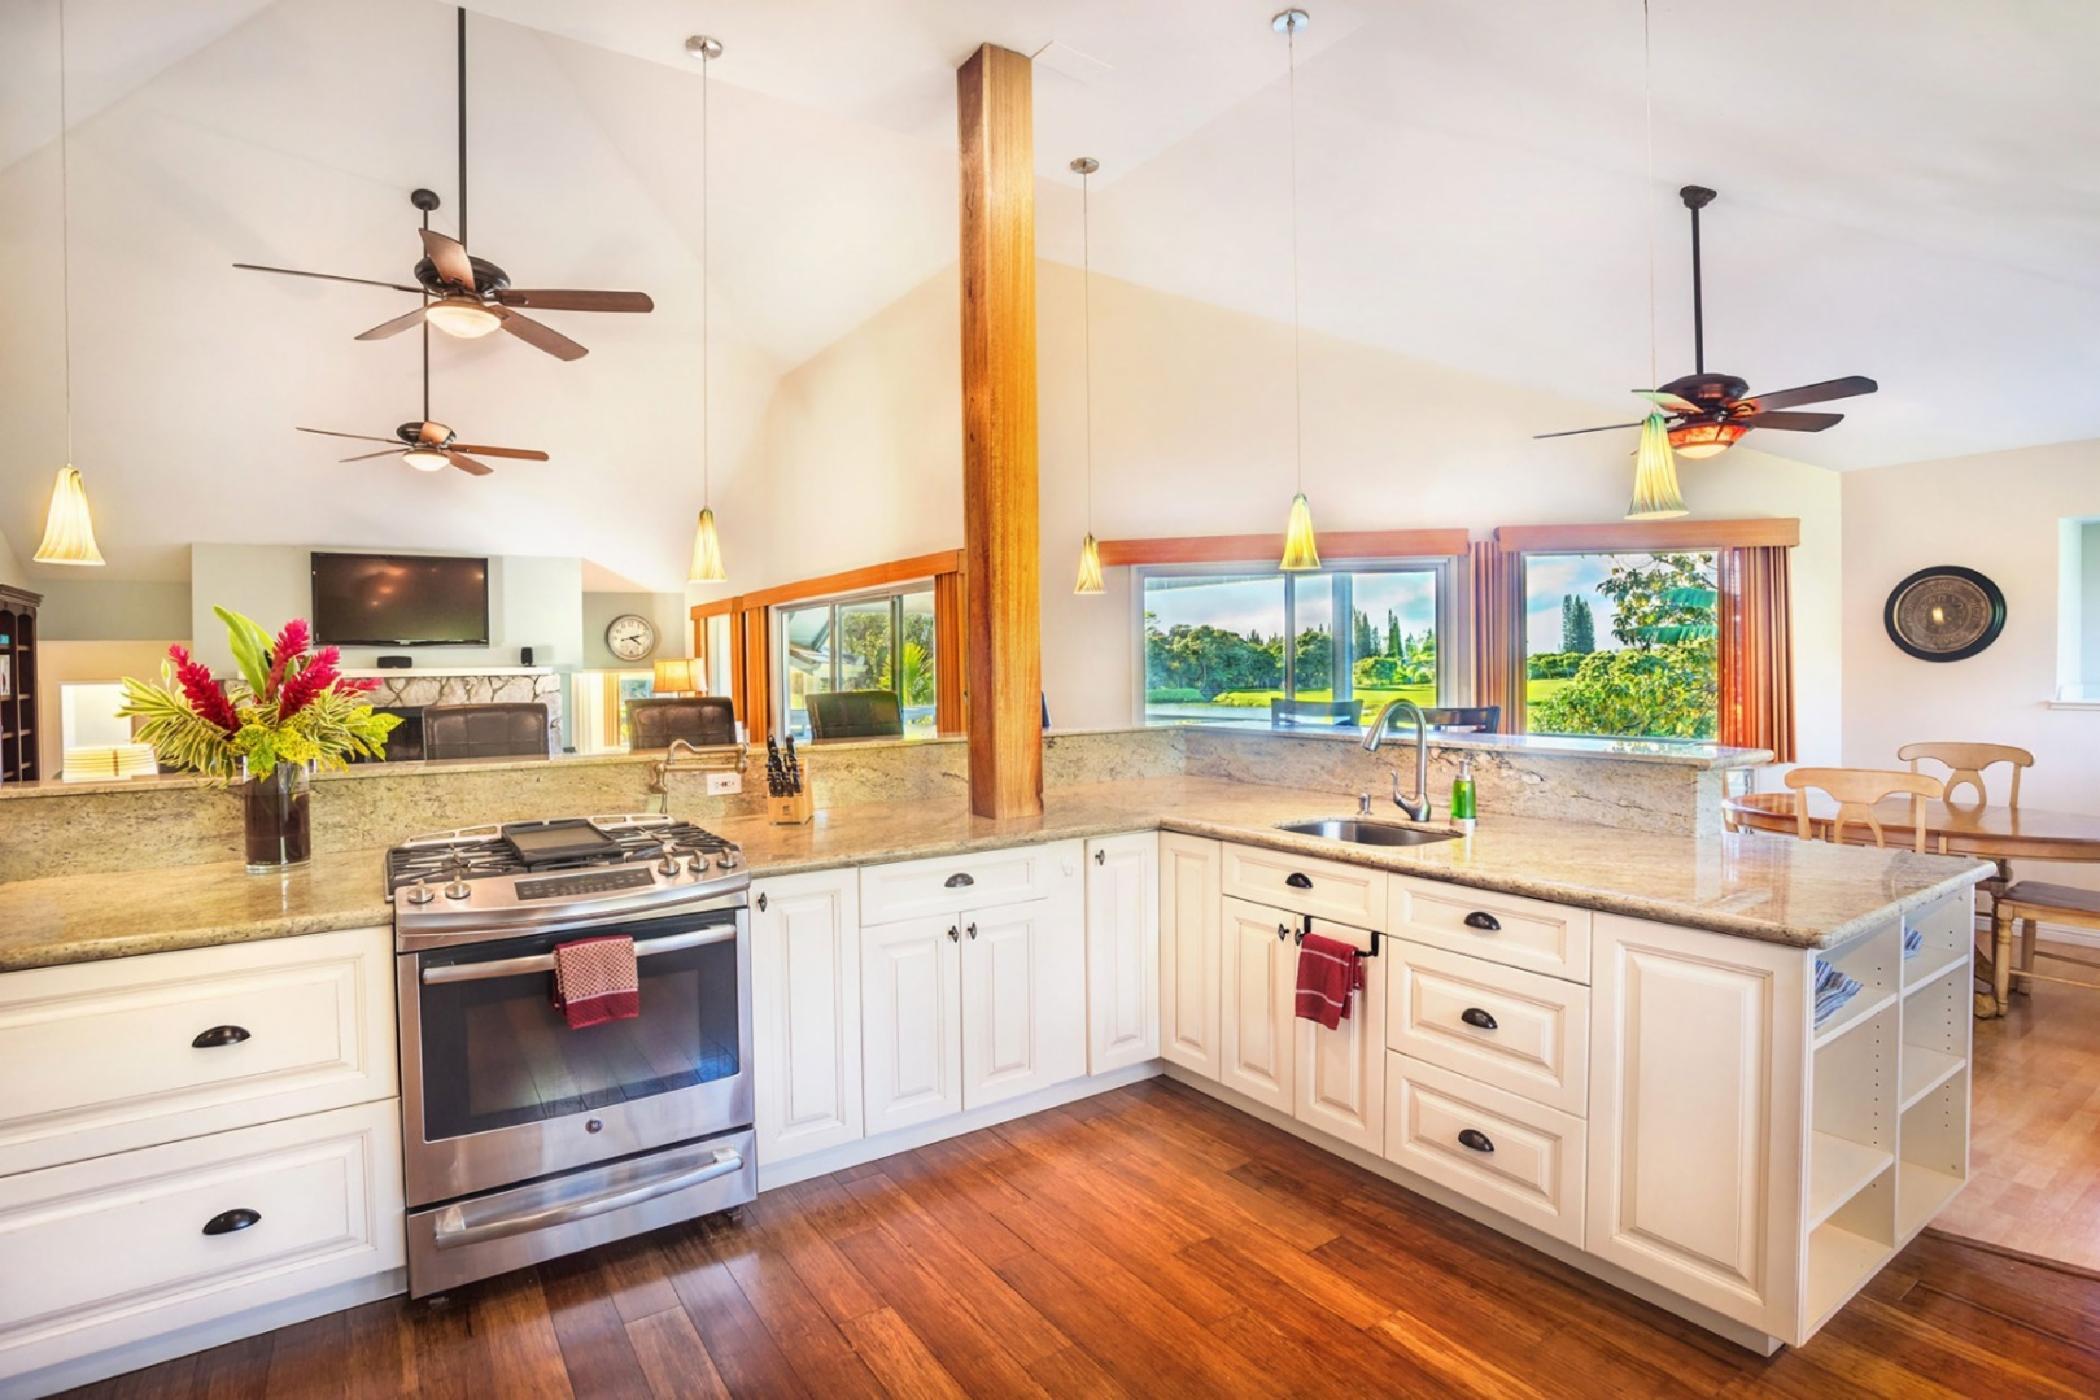 kitchen-oven-towards-living.jpeg